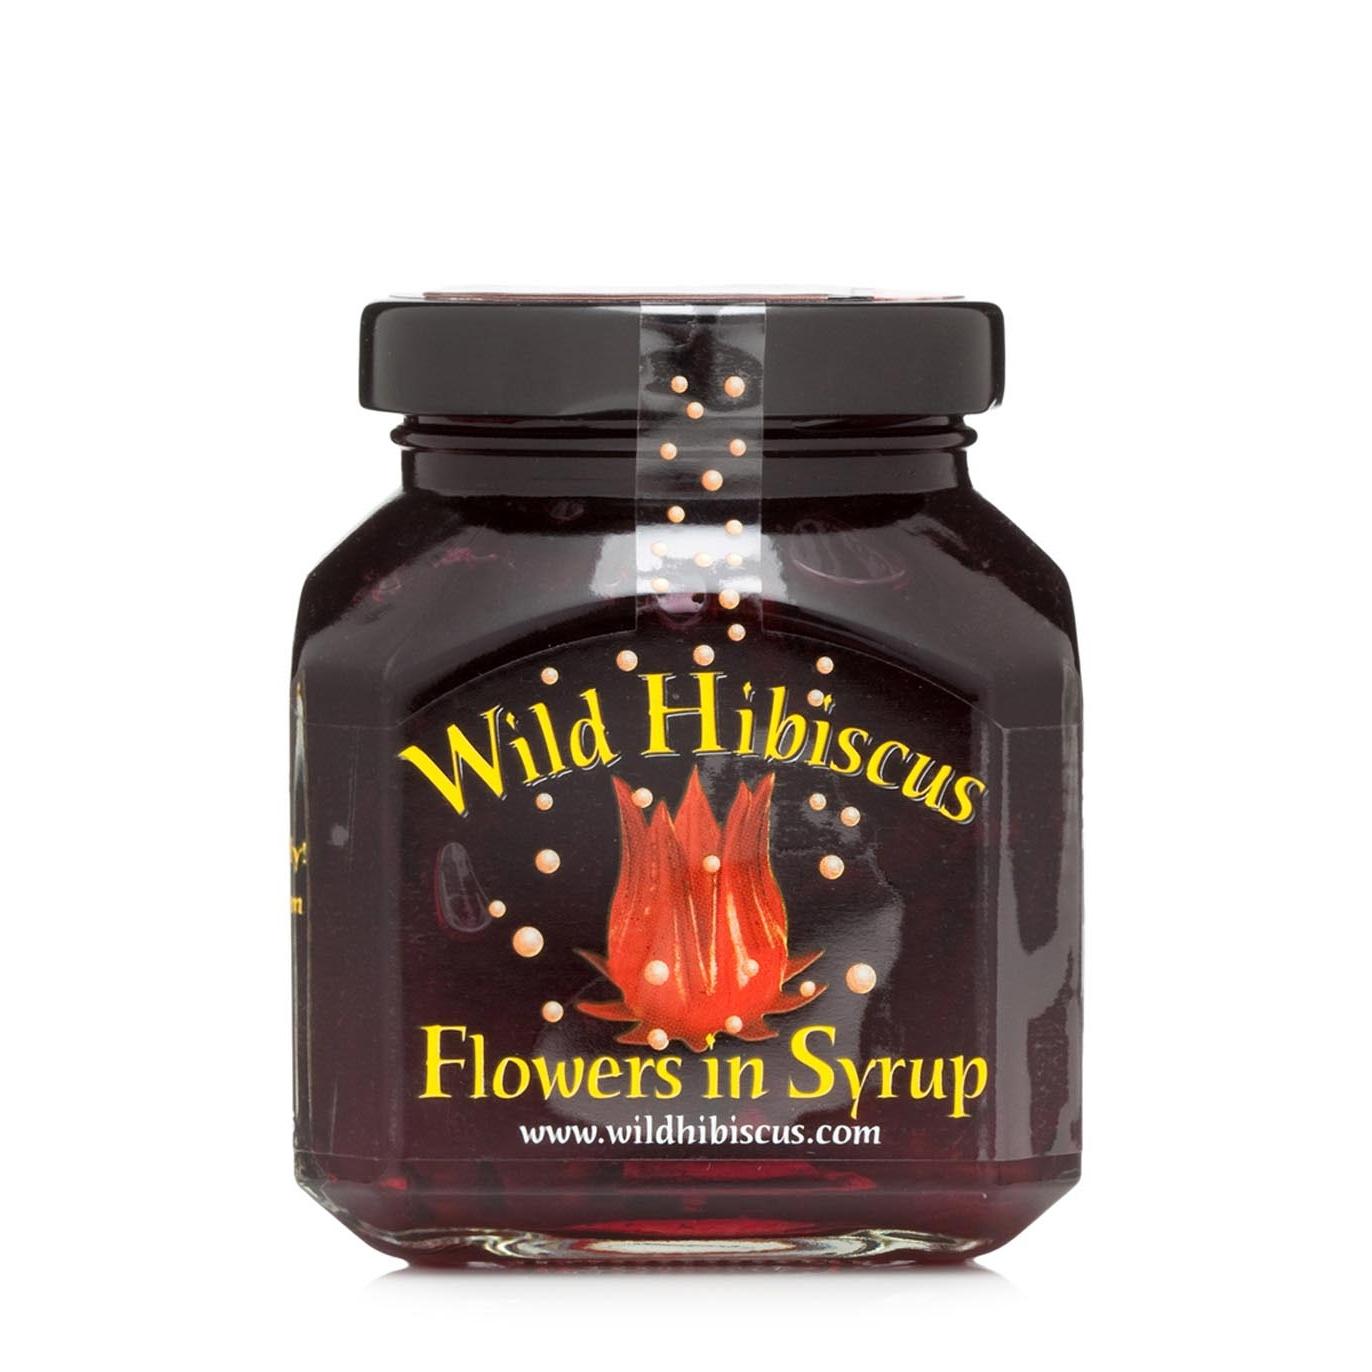 Wild hibiscus hibiscus flowers in syrup 250g harvey nichols izmirmasajfo